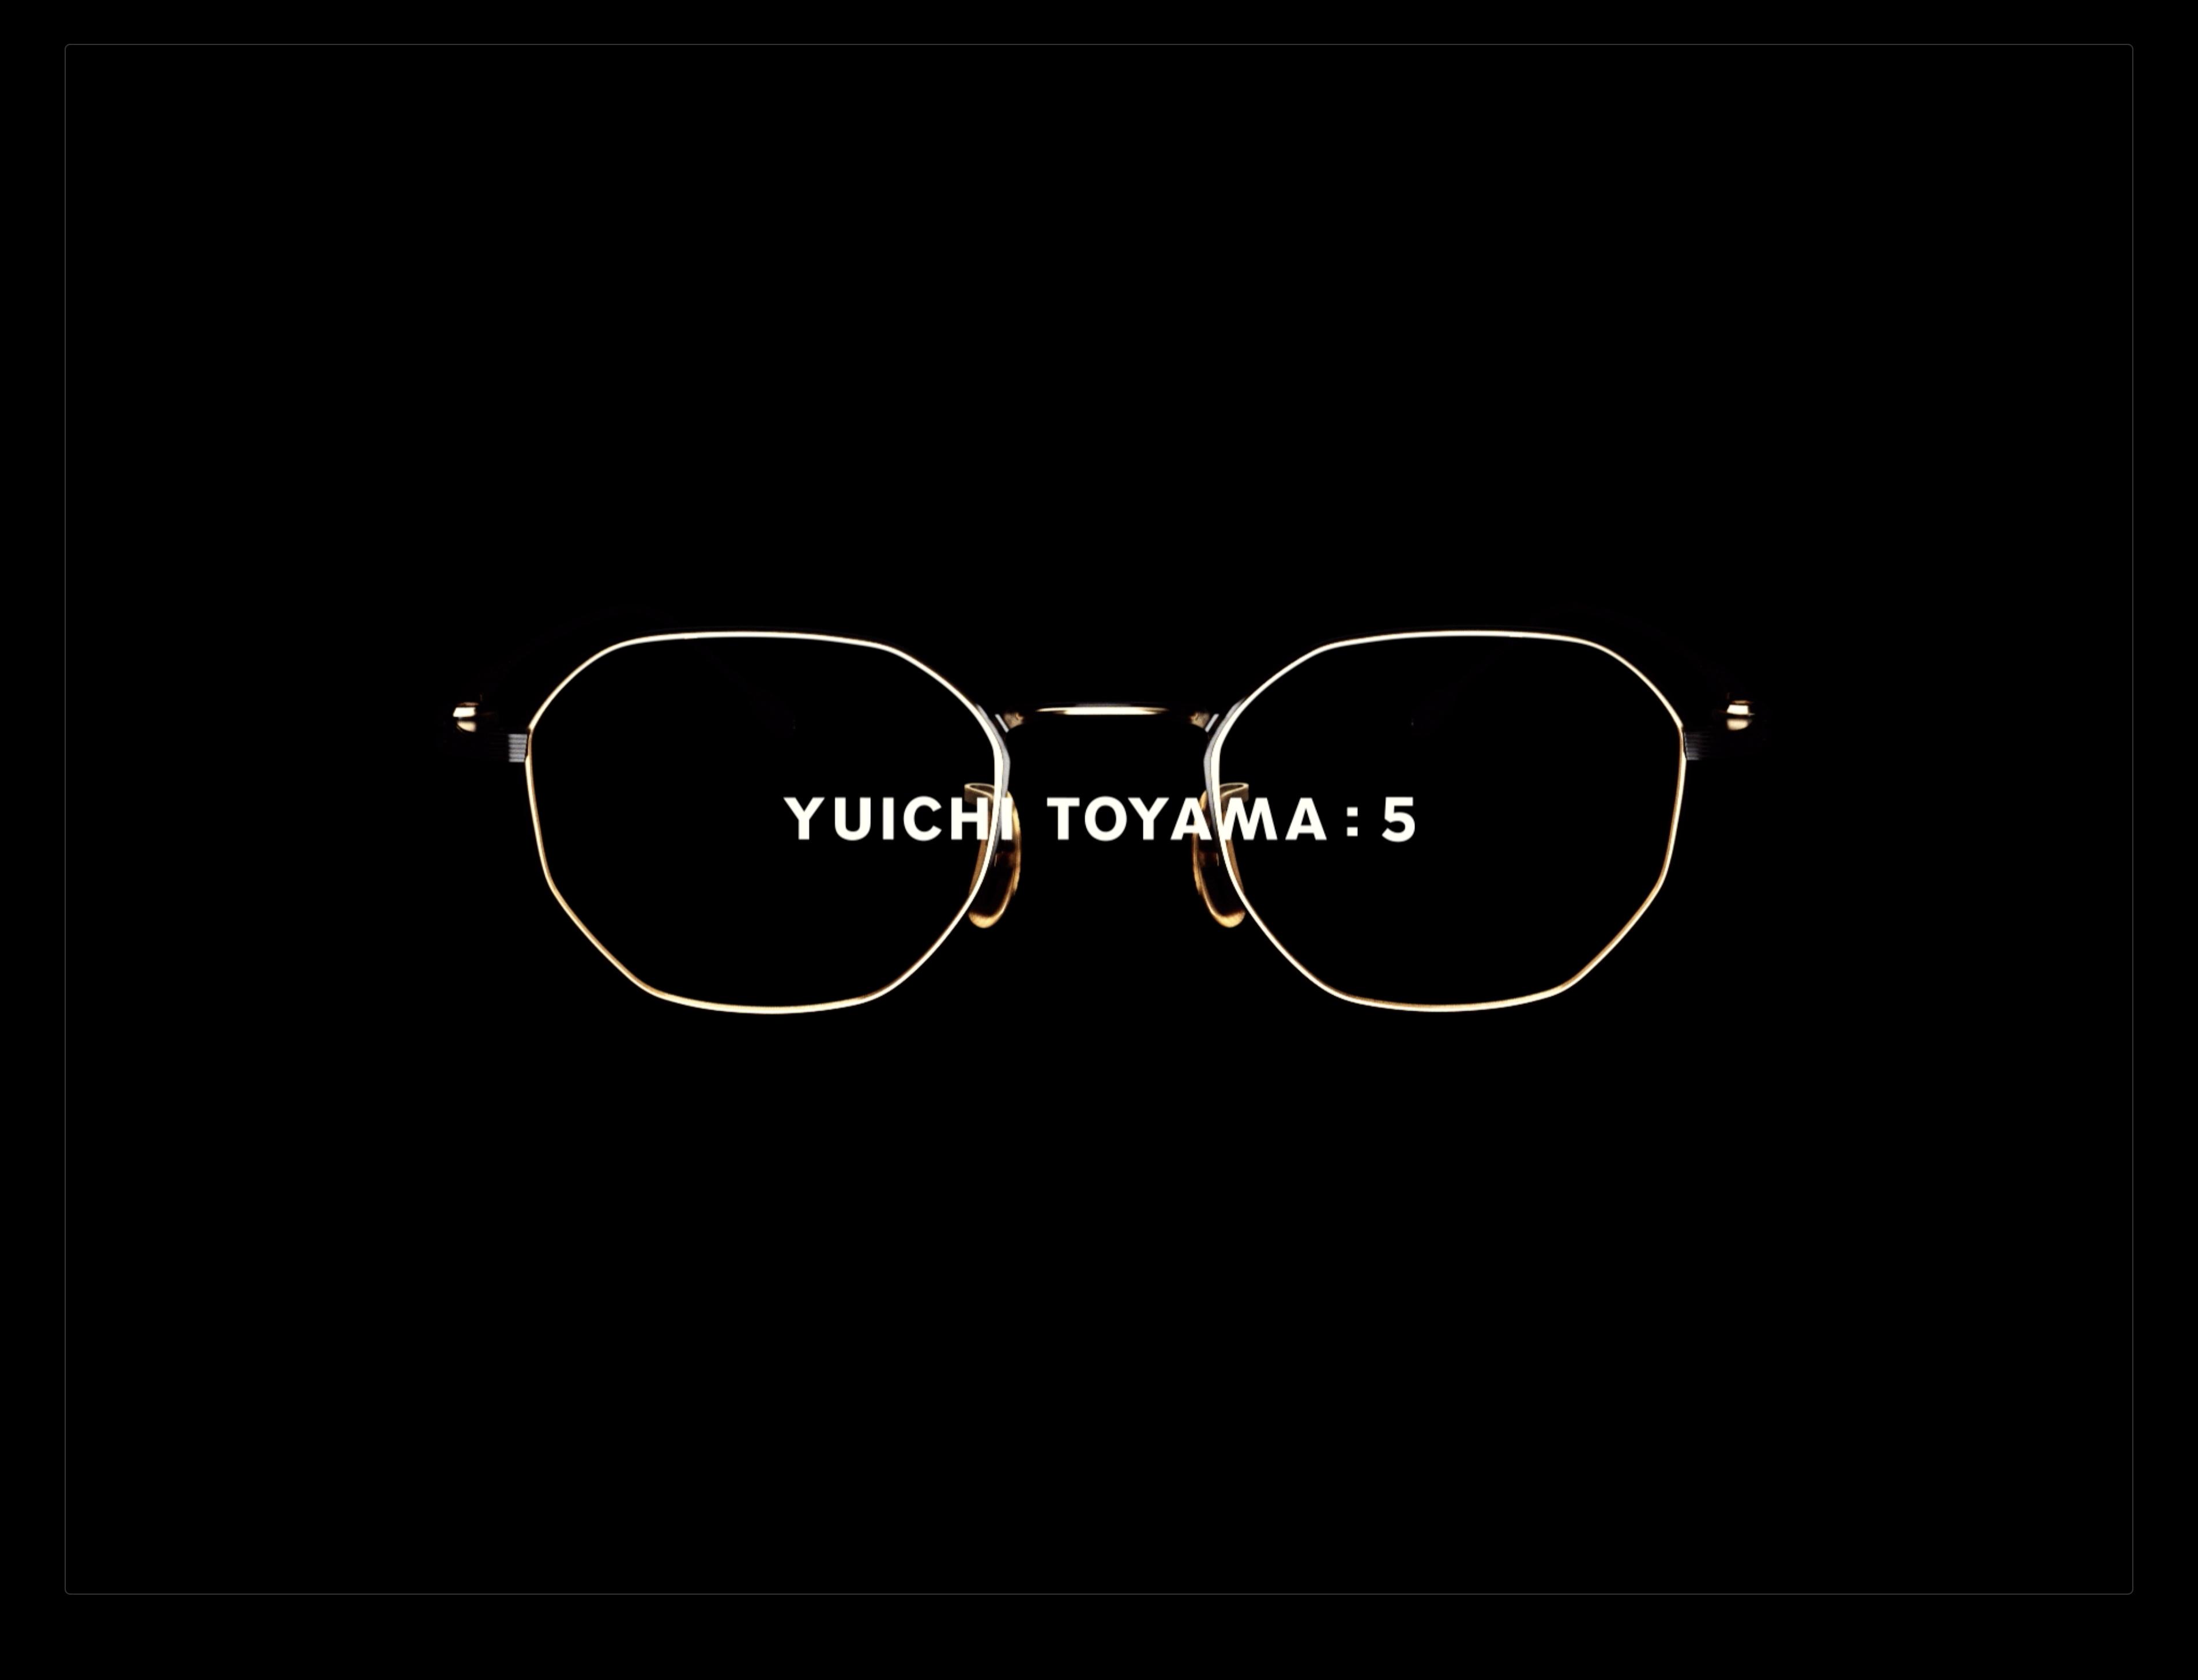 YUICHI TOYAMA:5|New concept series